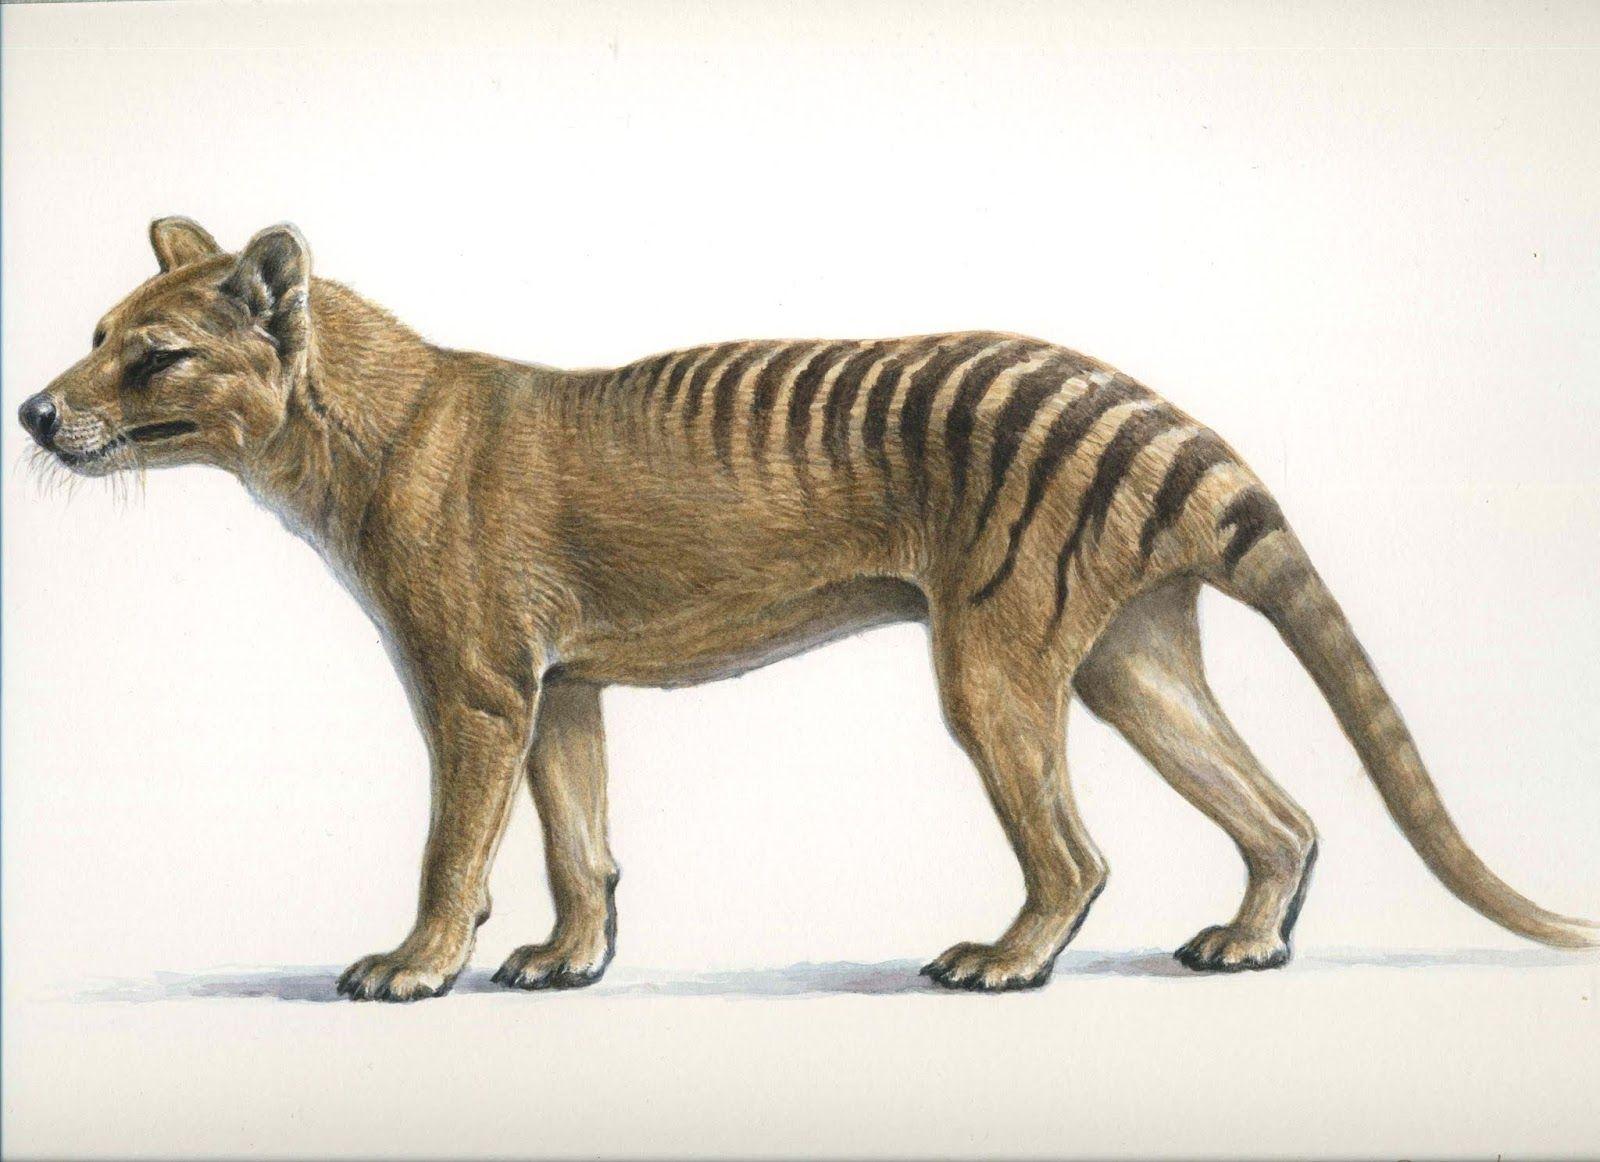 Thylacine Or Tasmanian Tiger The Adventure Of A Study In 2020 Thylacine Tasmanian Tiger Nearly Extinct Animals